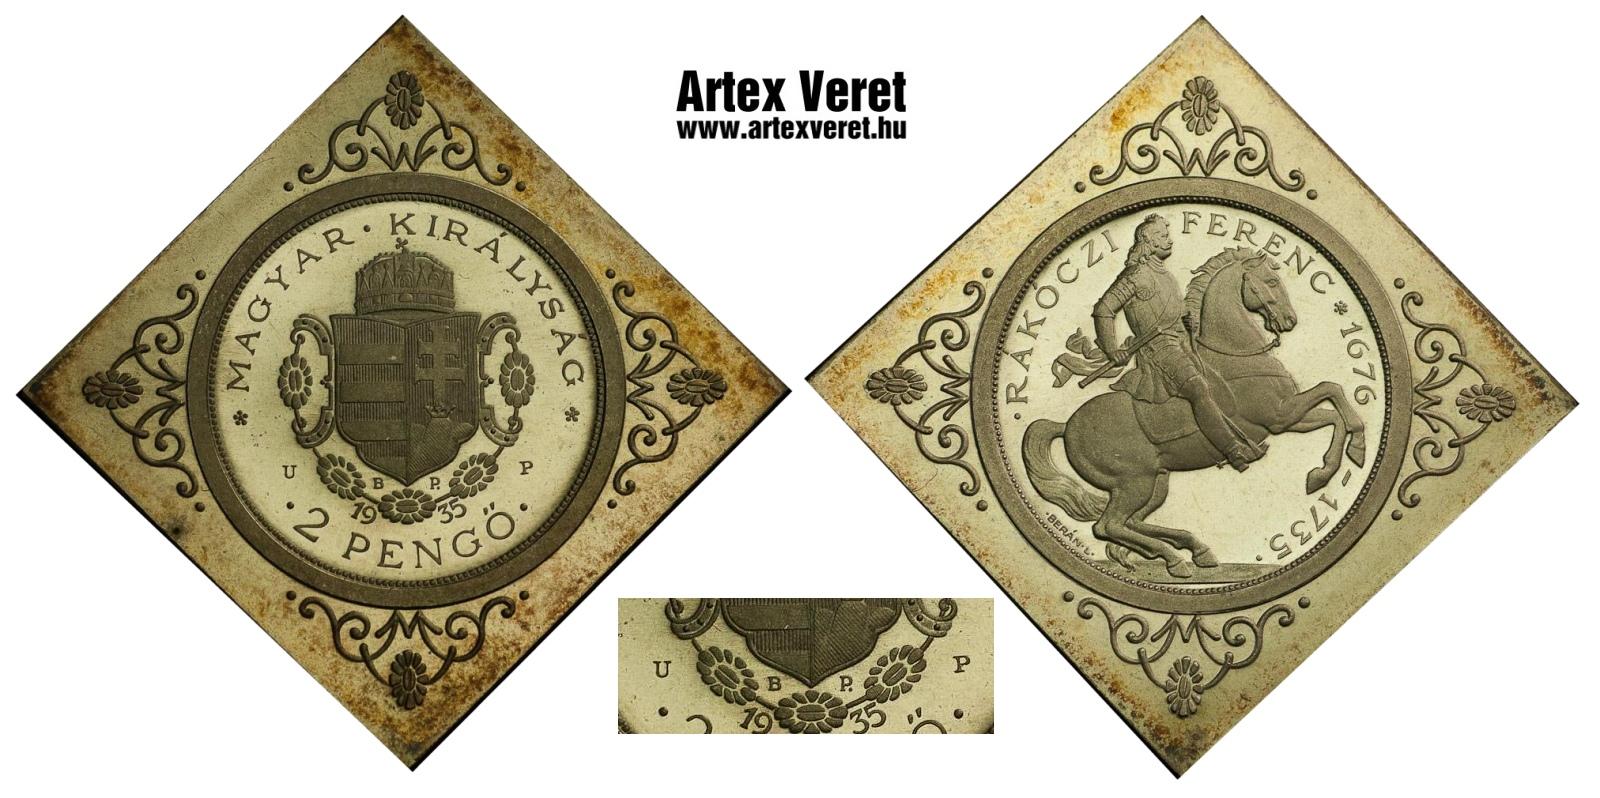 http://www.artexveret.hu/csegely/www_artexveret_hu_ezust_lovas_rakoczi_1935_up_csegely_2_pengo.jpg